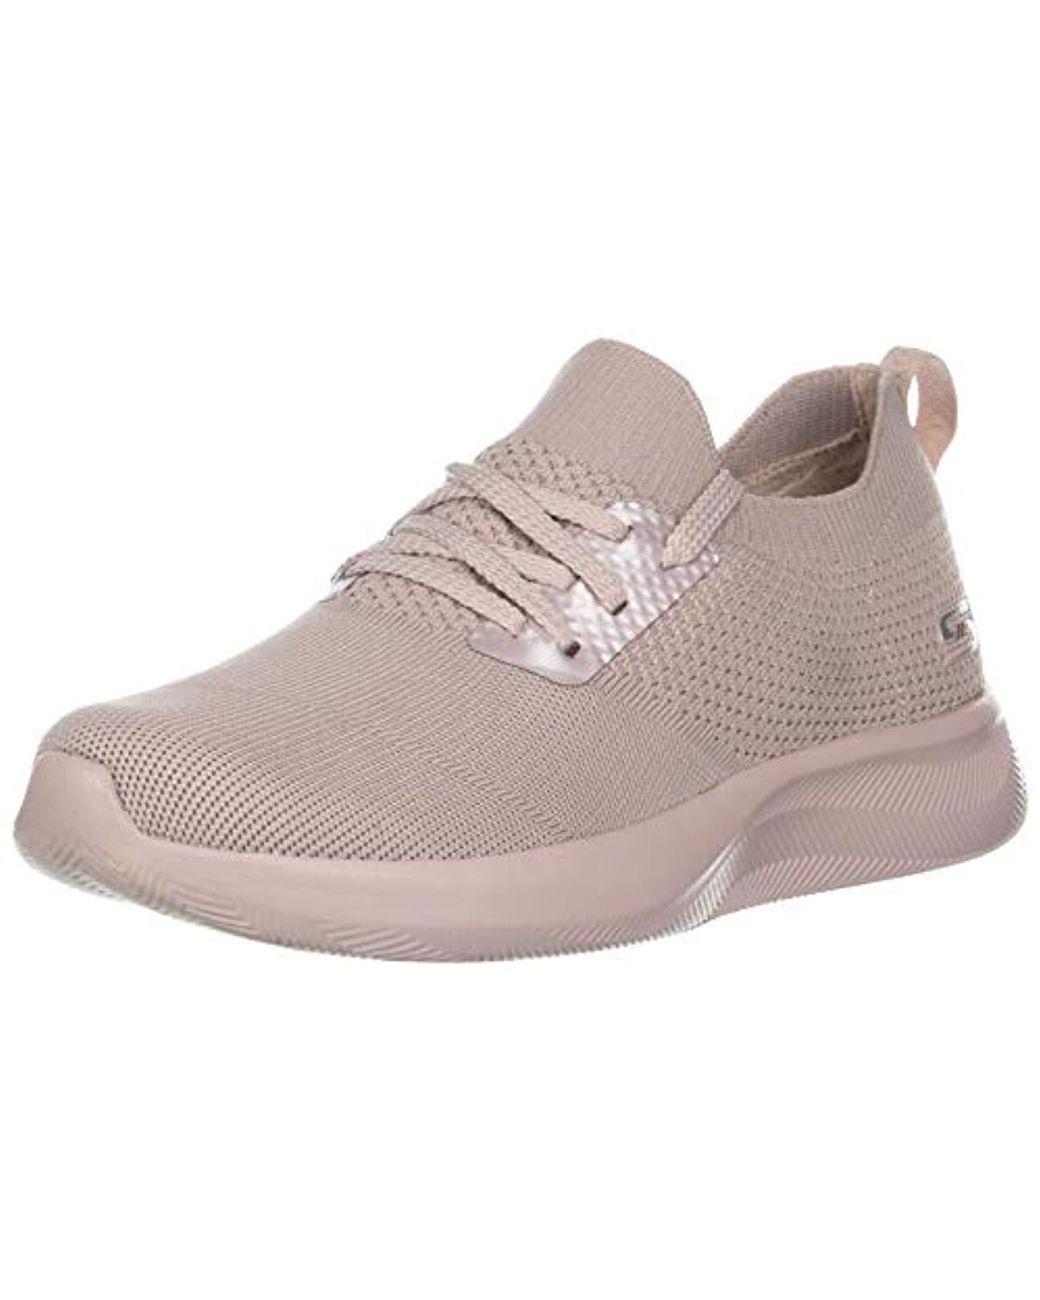 8e8802f36c32e Women's Bobs Squad 2. Sock Fit Slip On Engineered Knit Memory Foam Sneaker